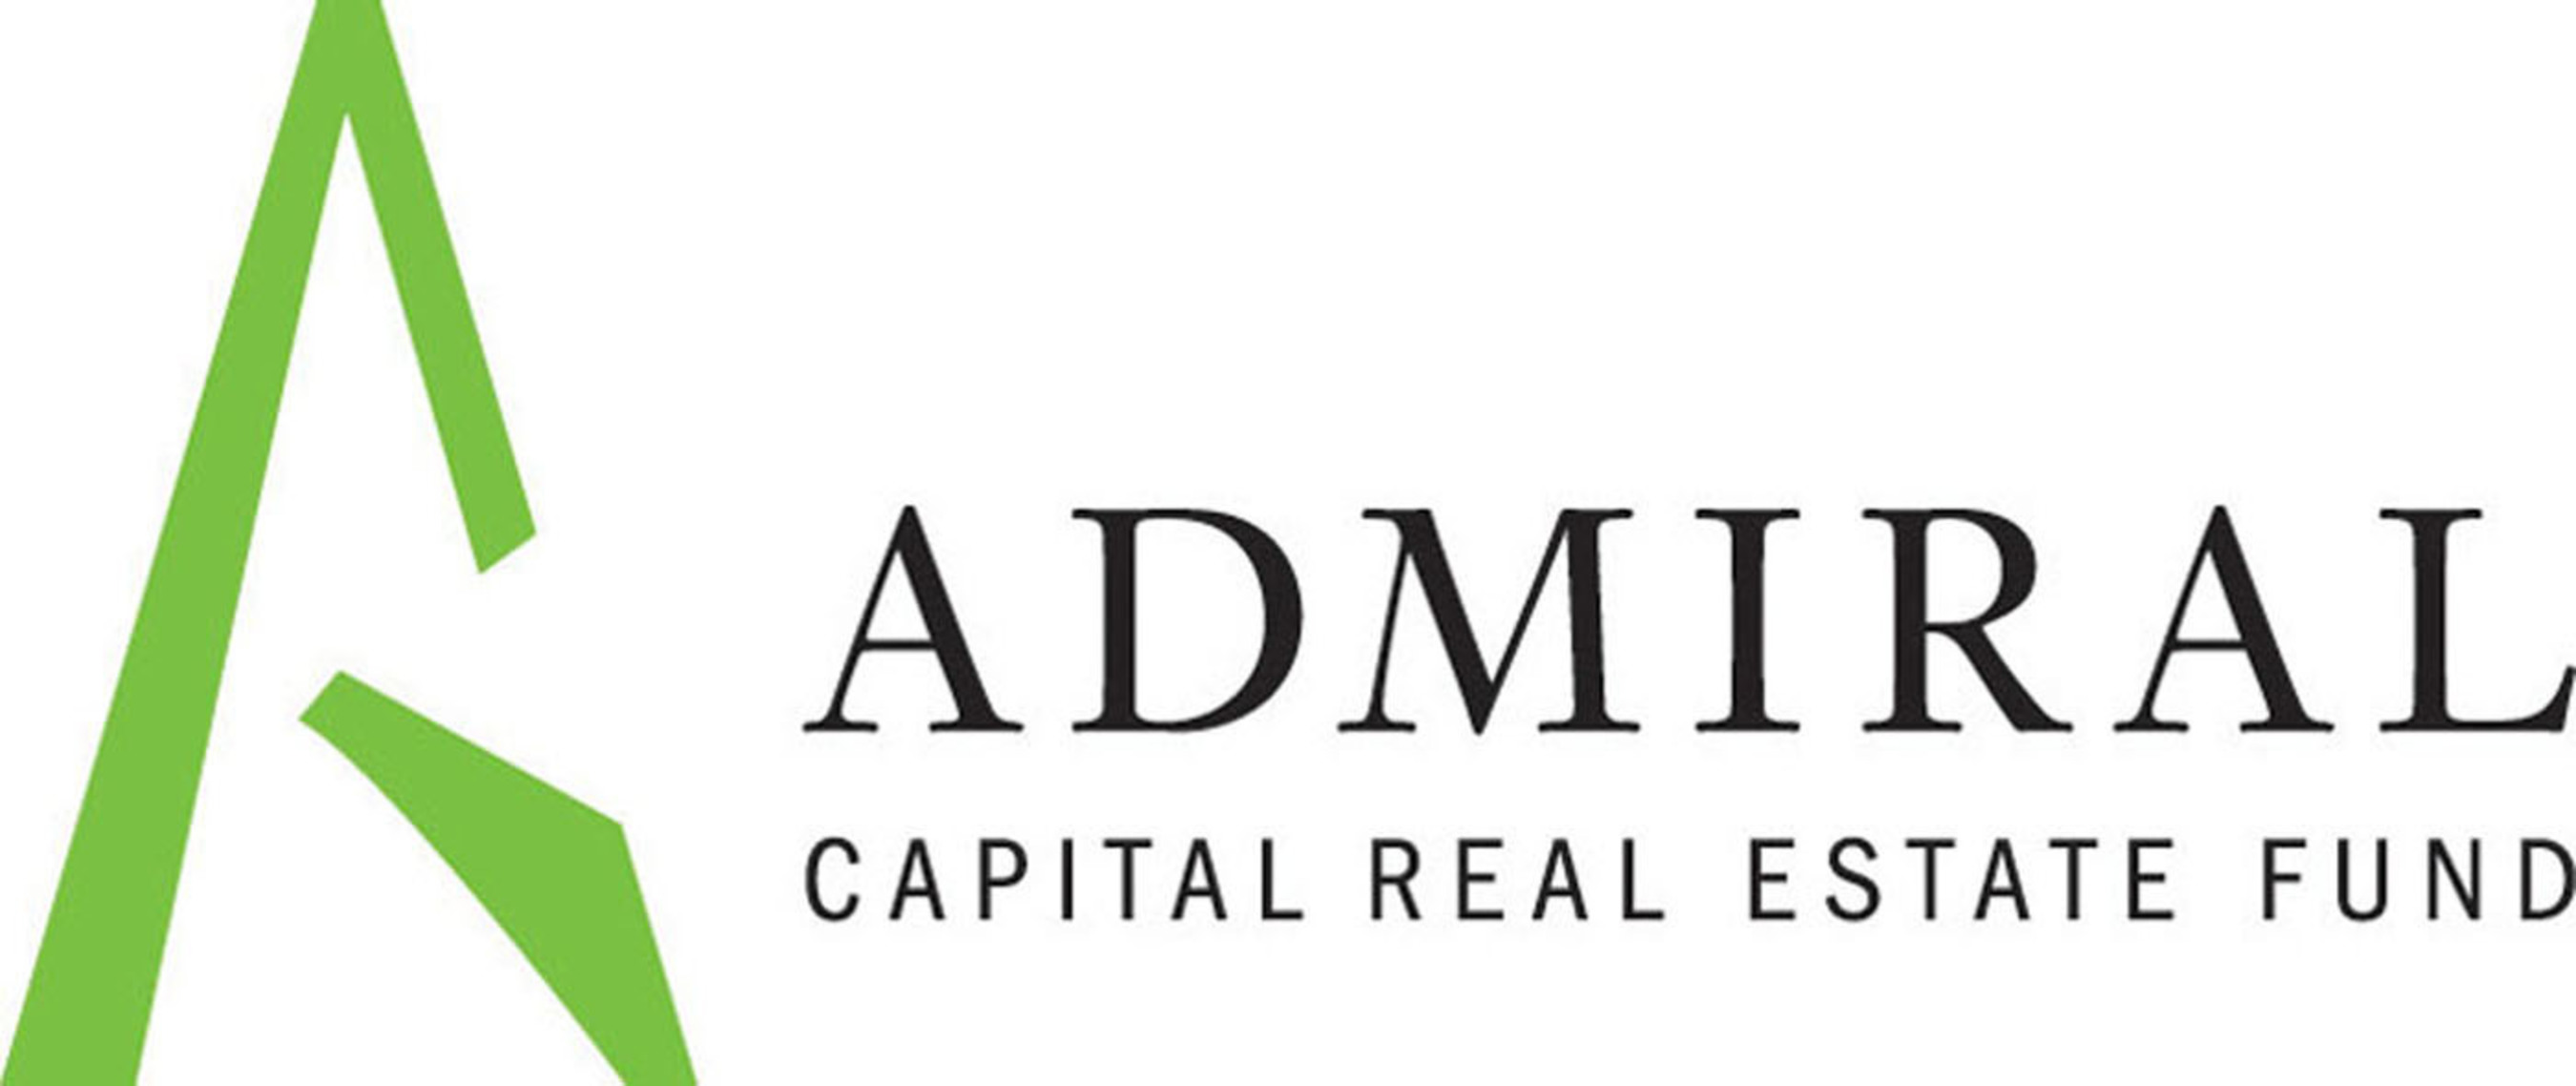 Admiral Capital Real Estate Fund logo.